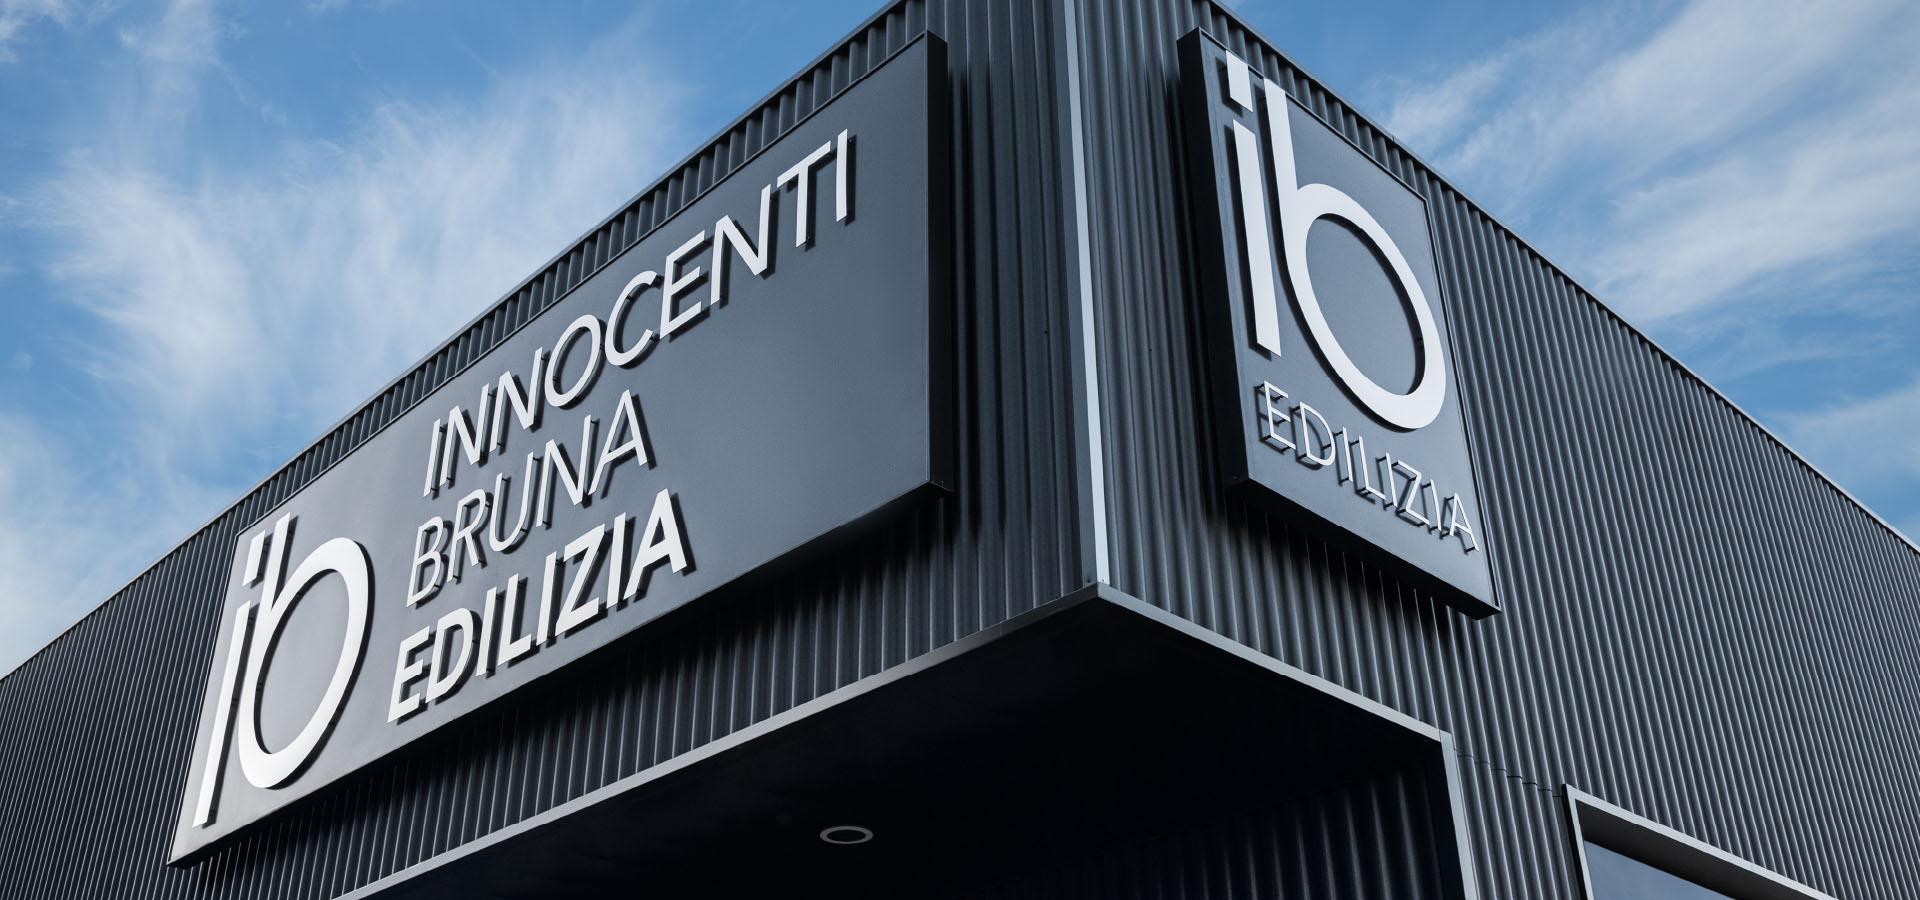 image of Innocenti Bruna